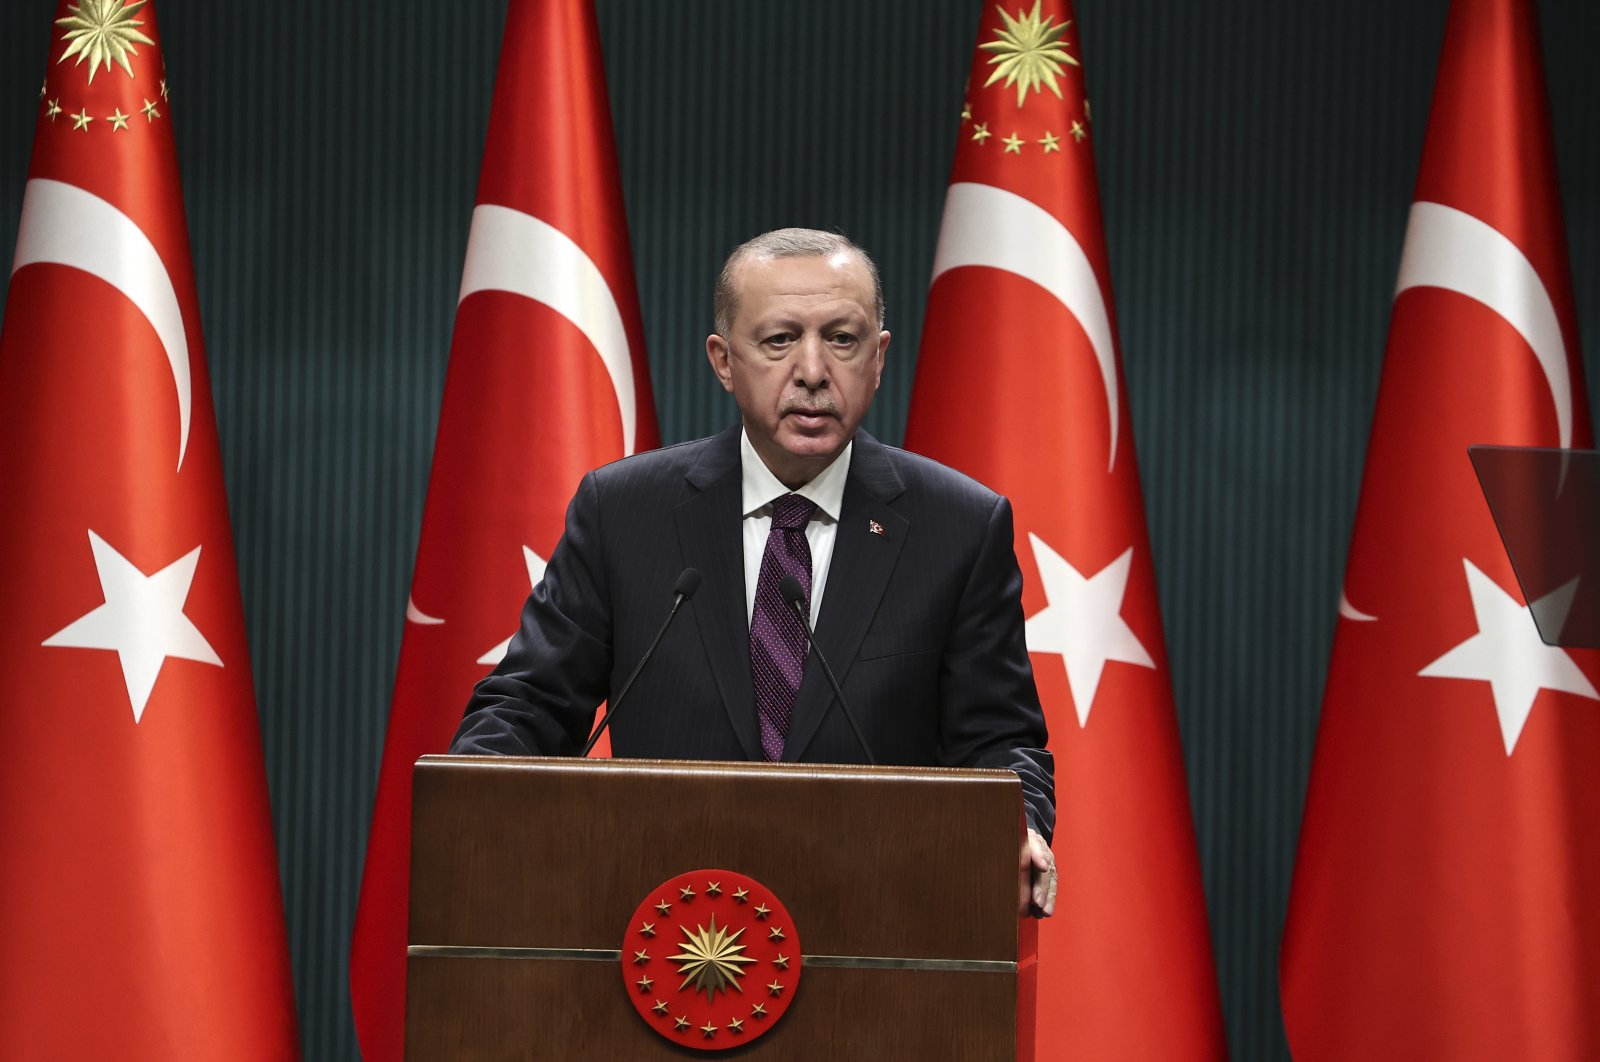 President Recep Tayyip Erdoğan speaks after a Cabinet meeting in the capital Ankara, Dec. 28, 2020. (AA Photo)